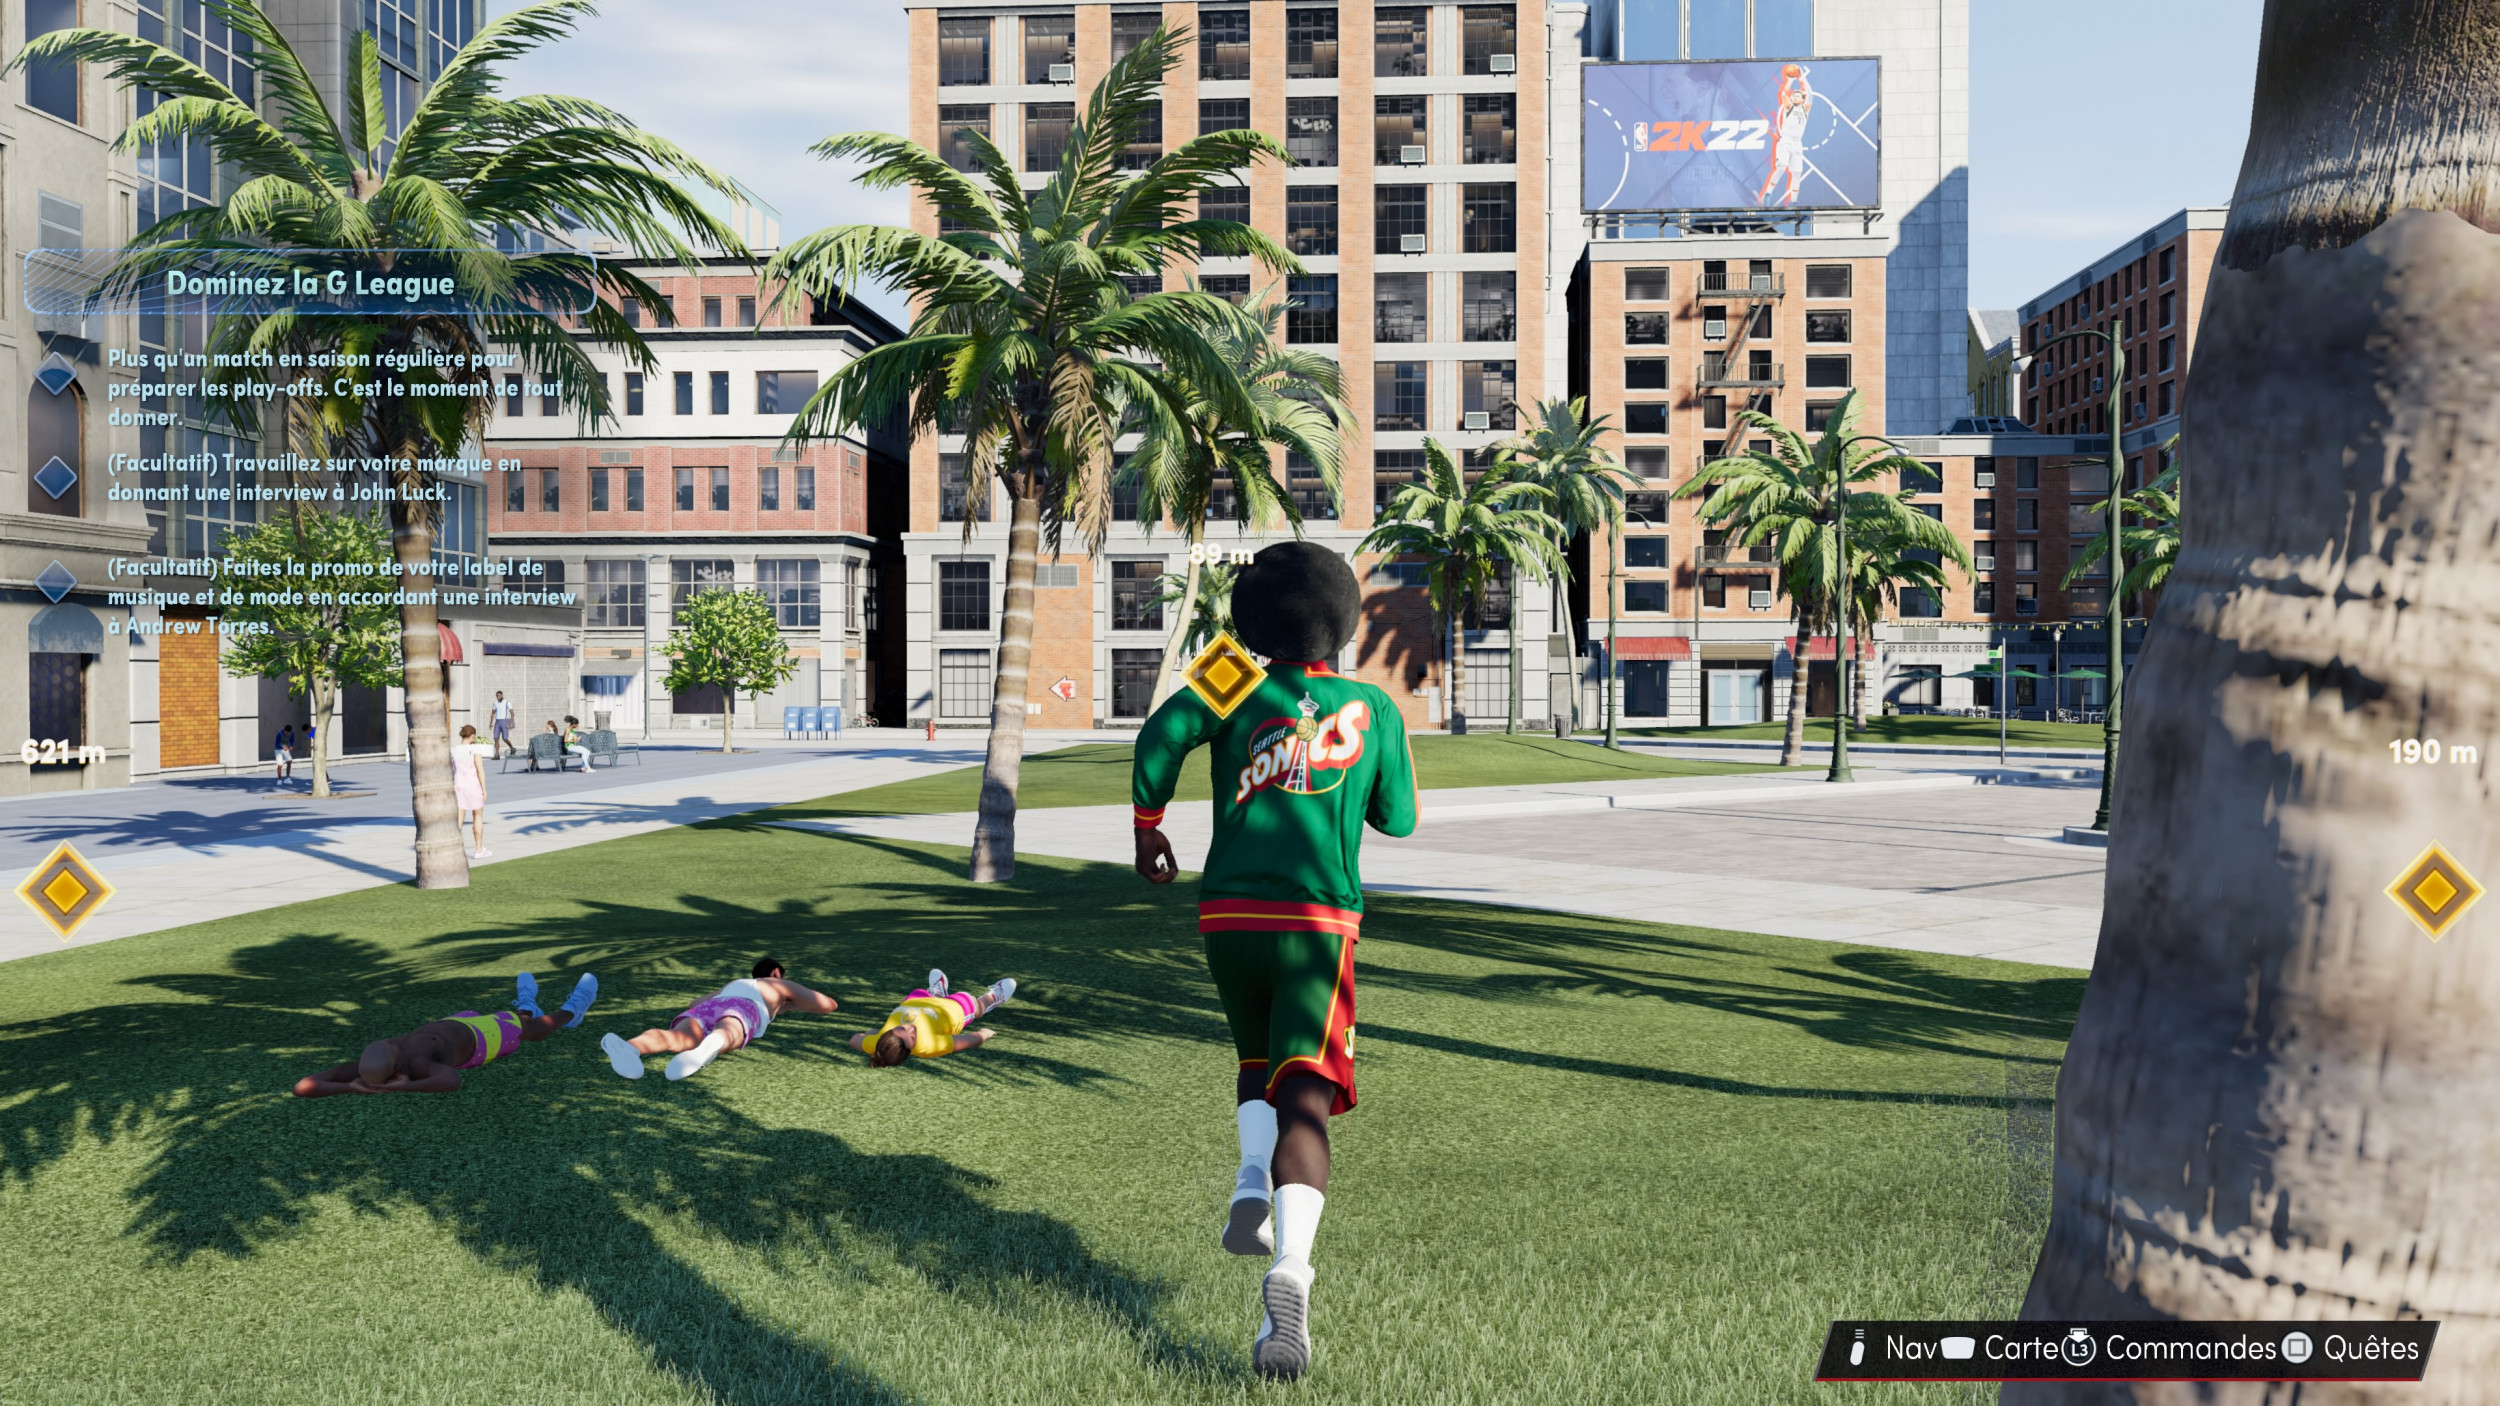 Xbox Series X & S NBA 2K22